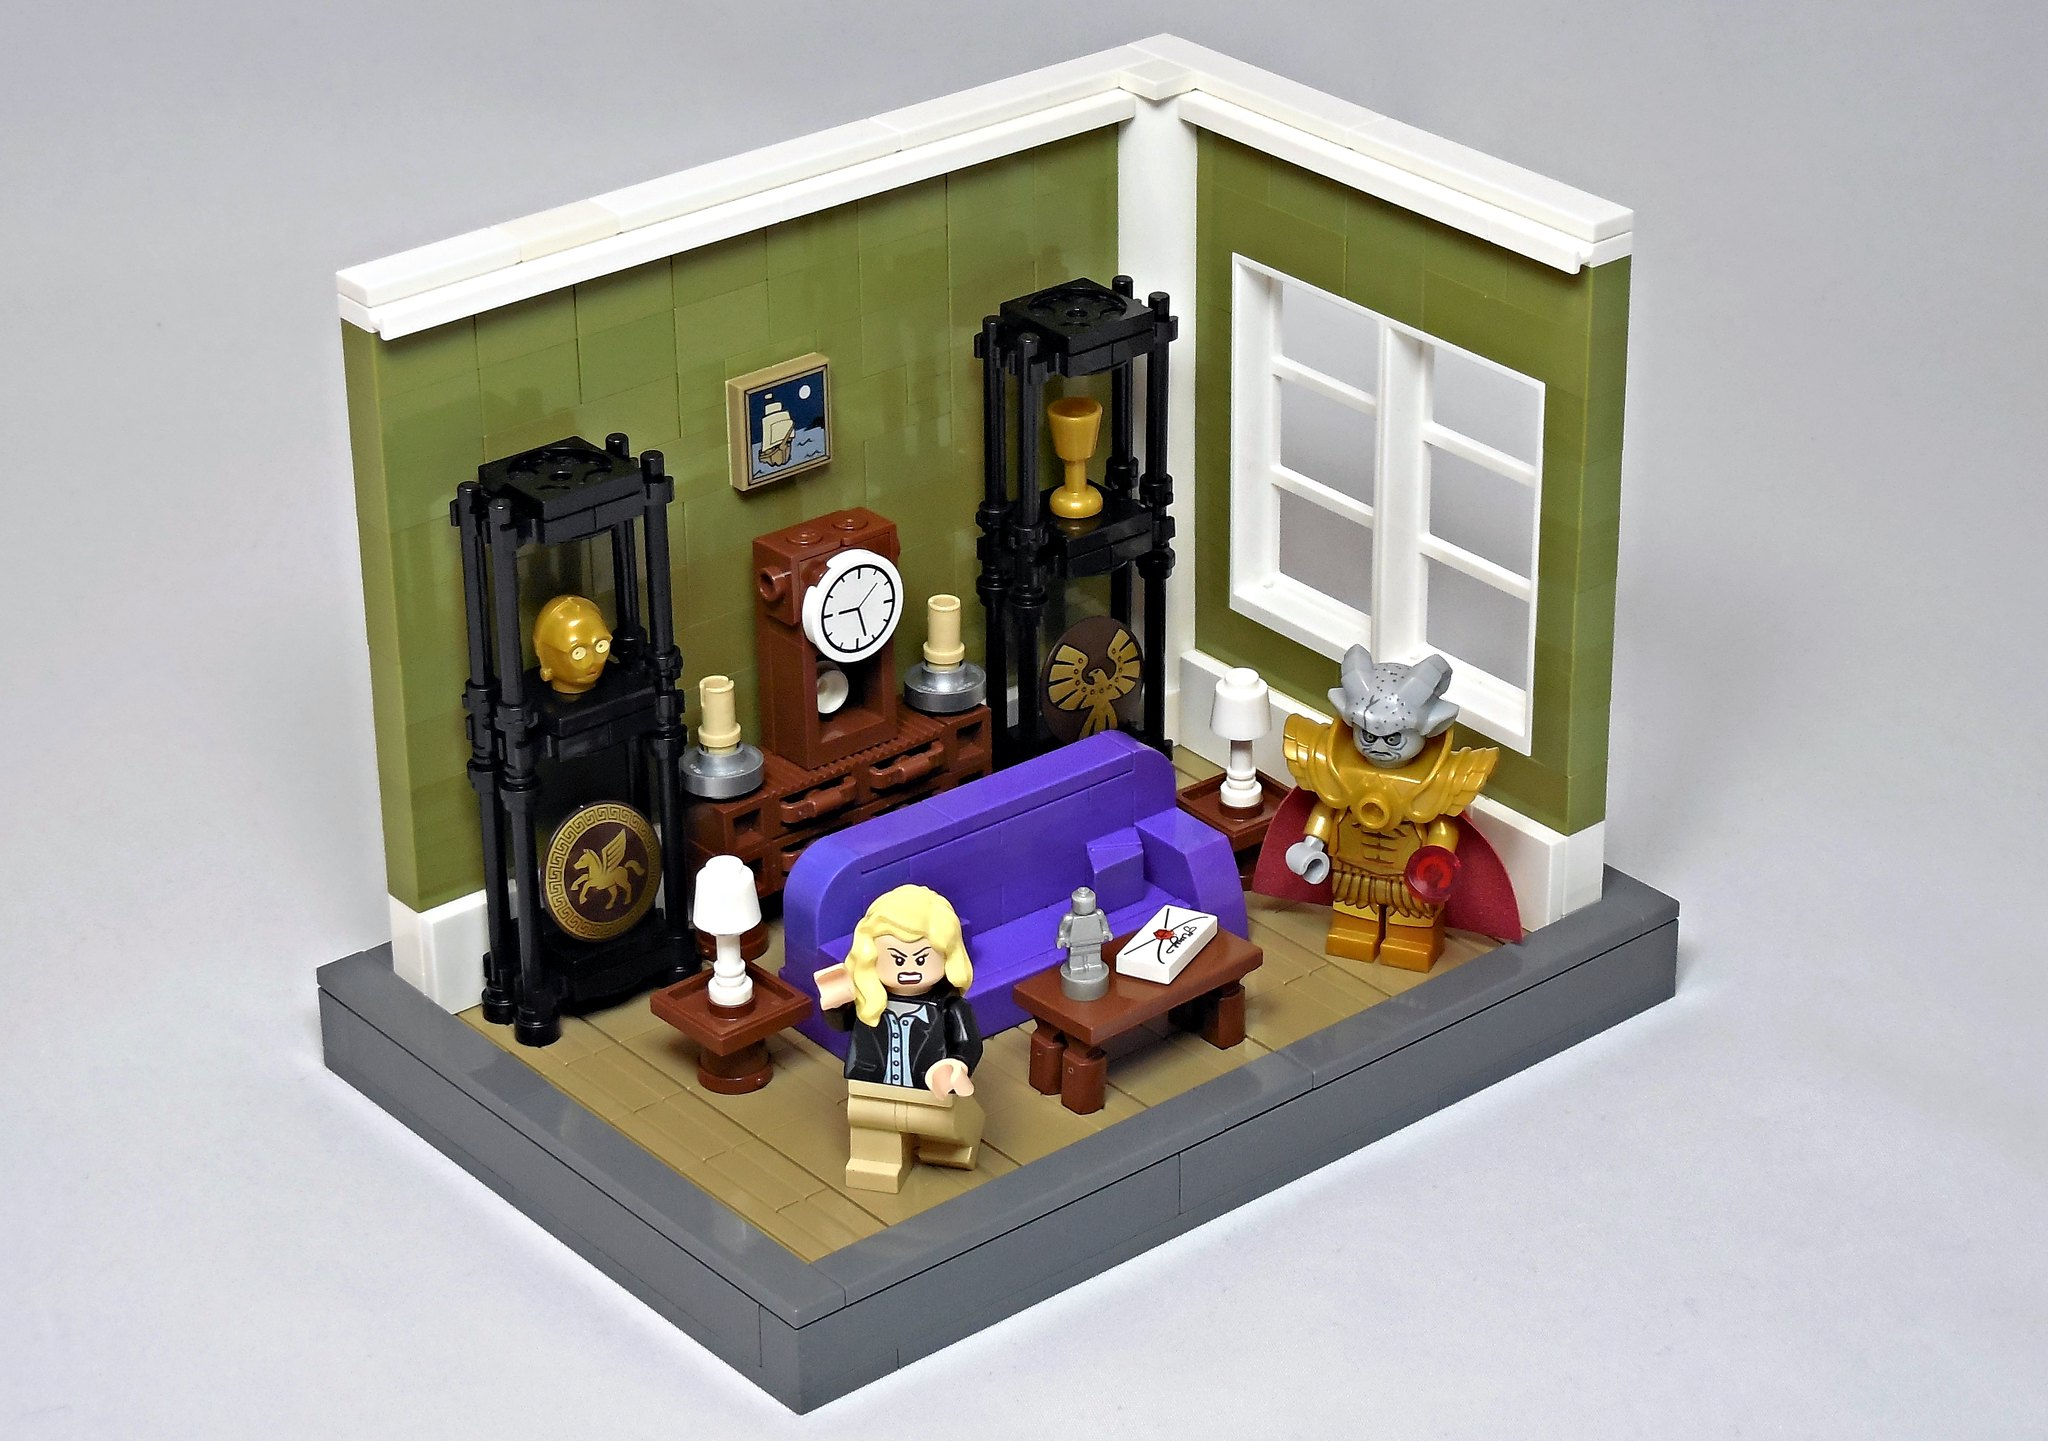 LEGO® MOC by Vitreolum: Wishmaster